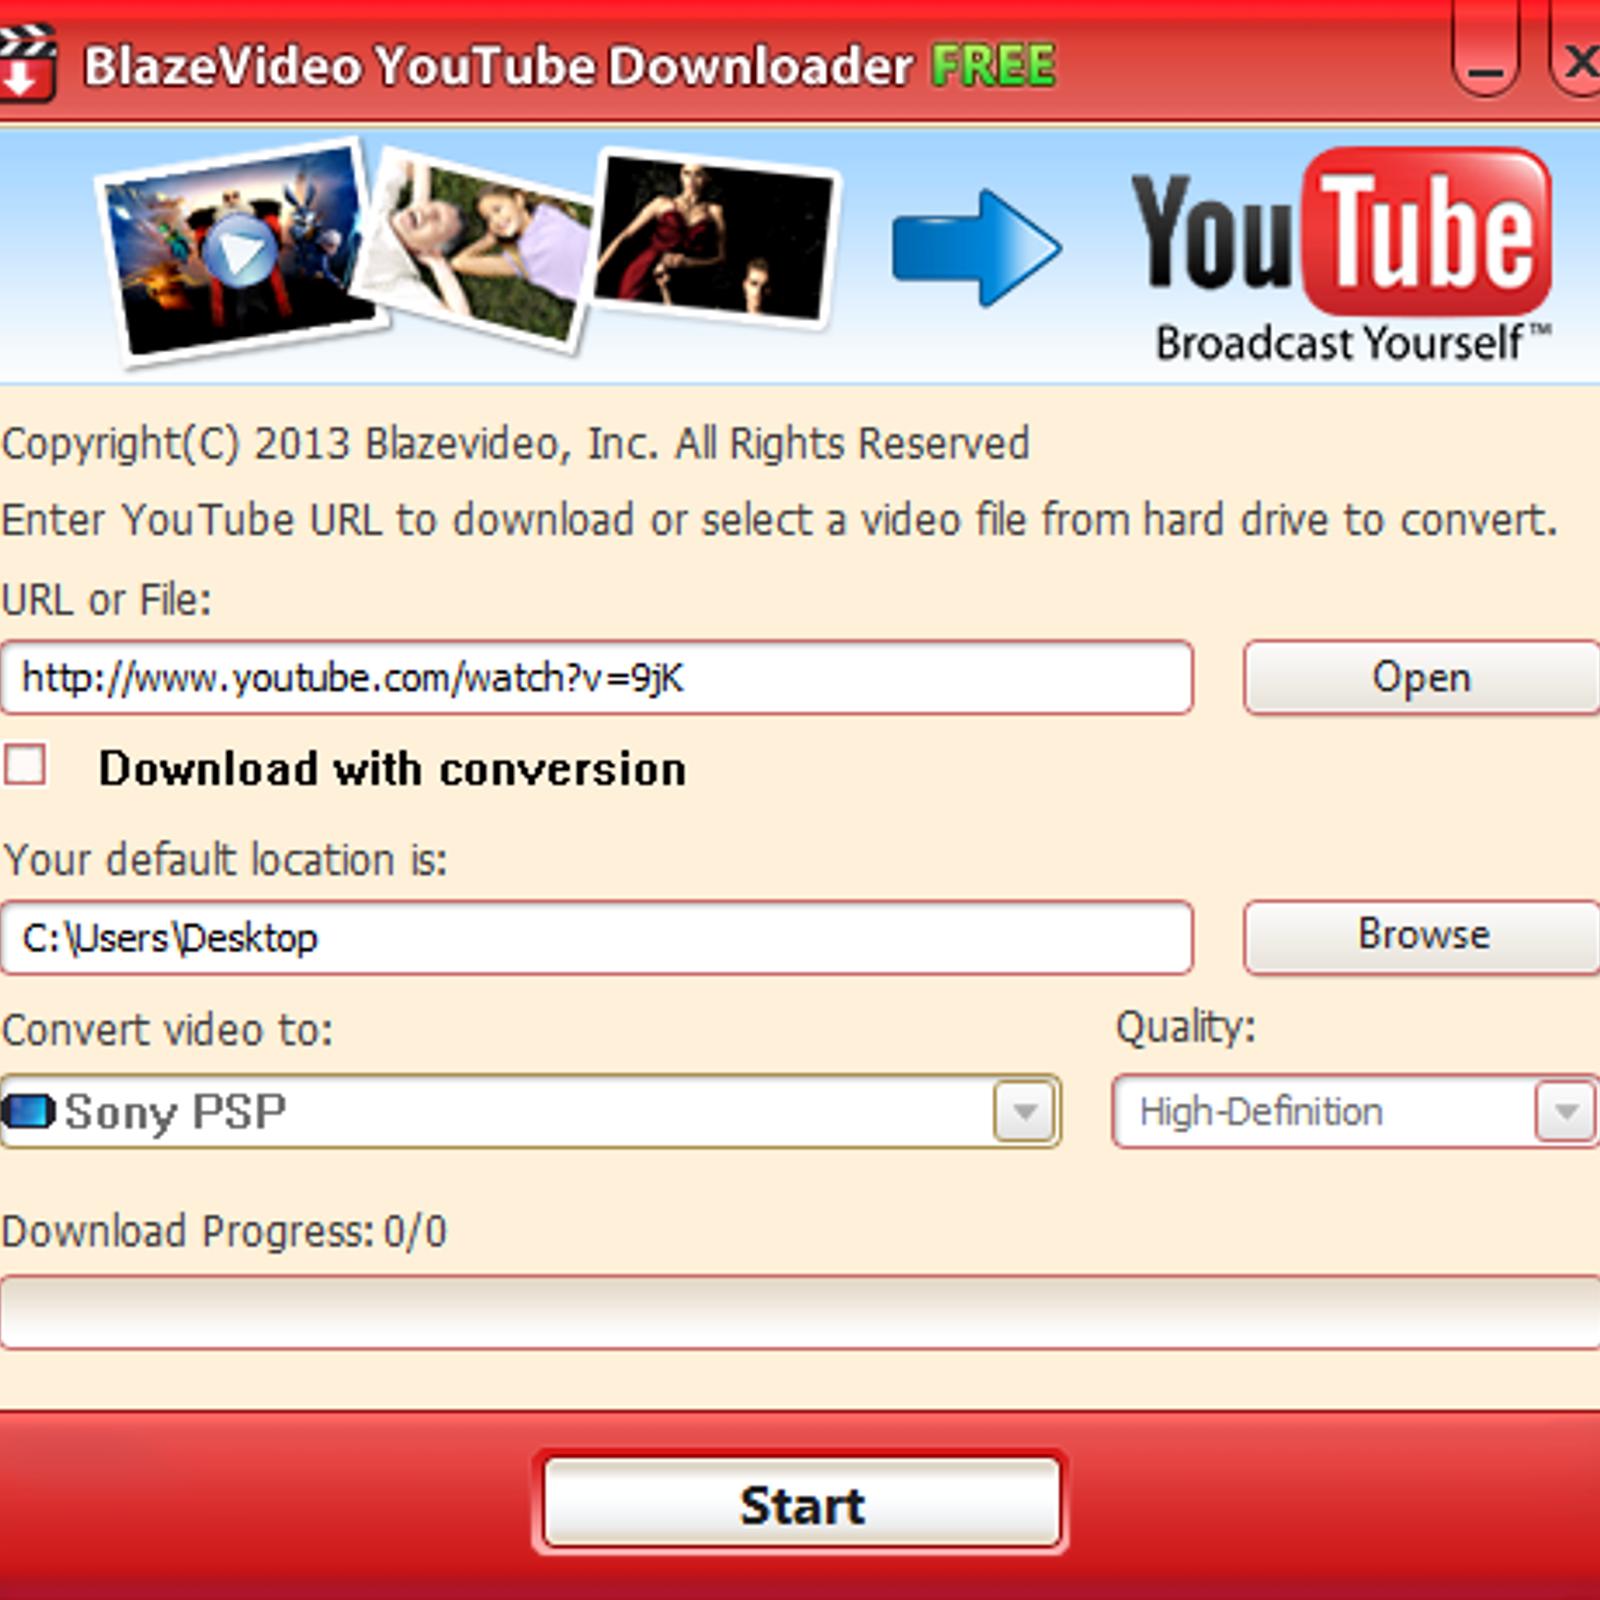 BlazeVideo Free YouTube Downloader Alternatives and Similar